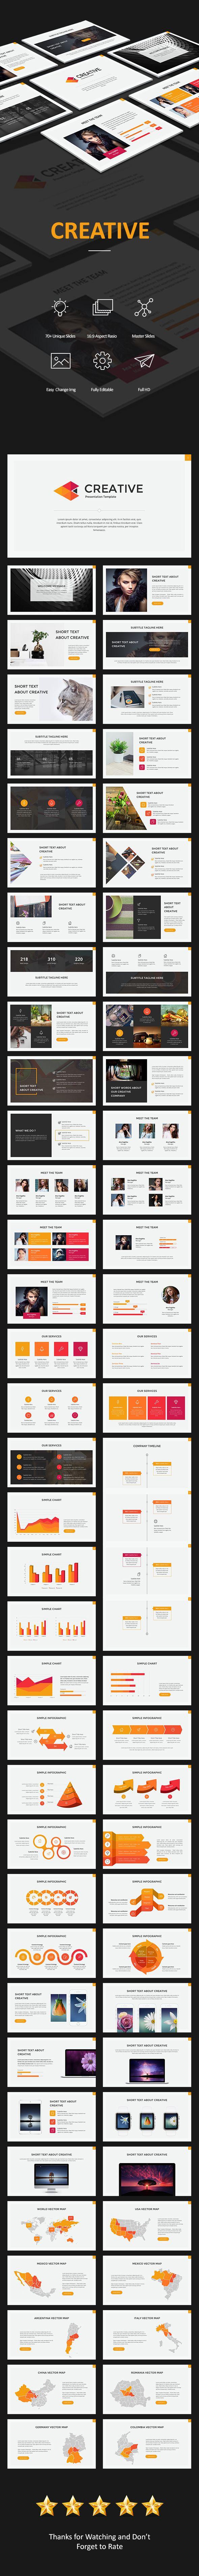 features 70 unique creative slides 400 vector icon animated